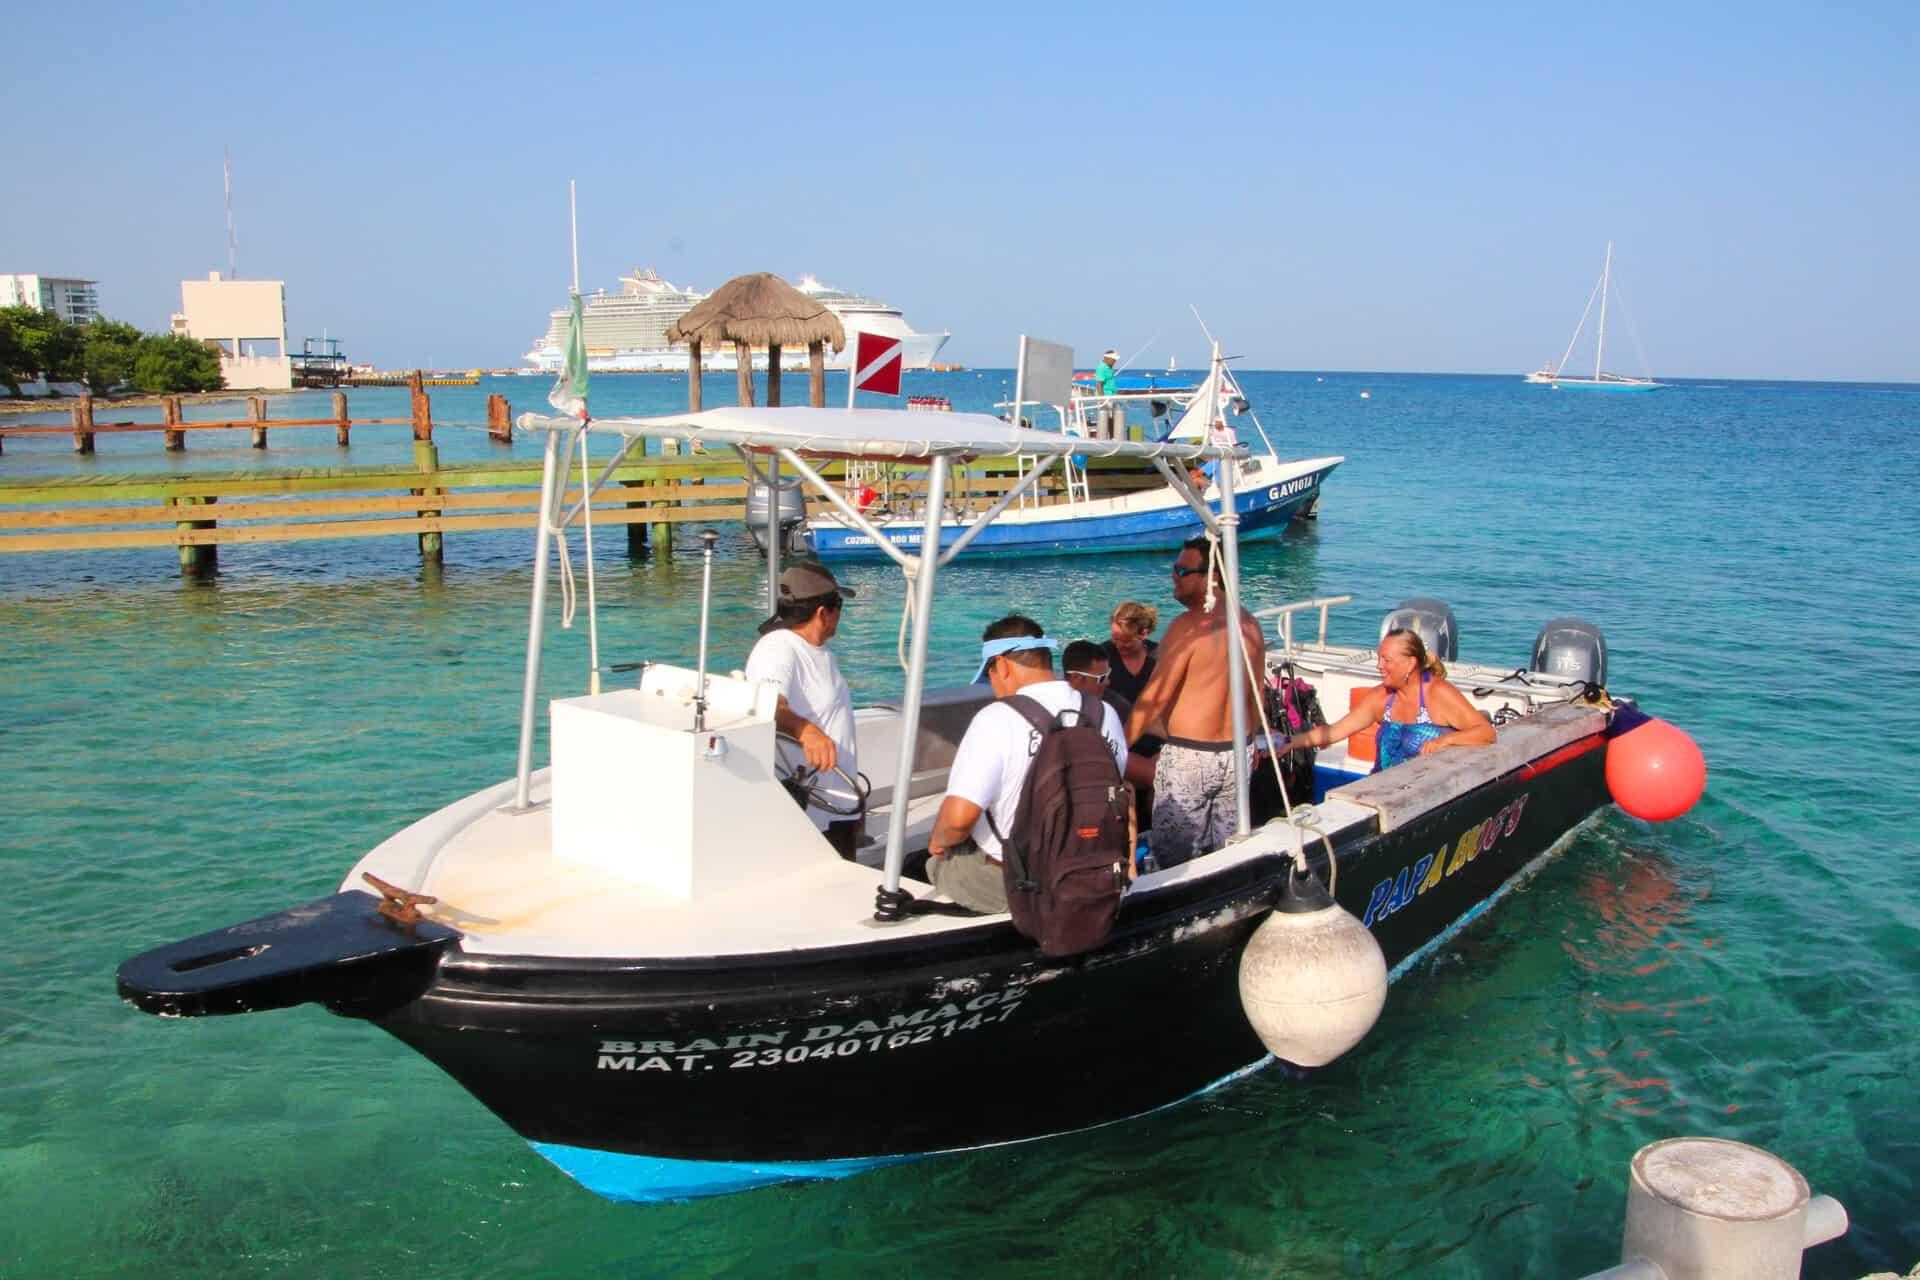 cozumel private snorkeling fast boat   bahamas cruise